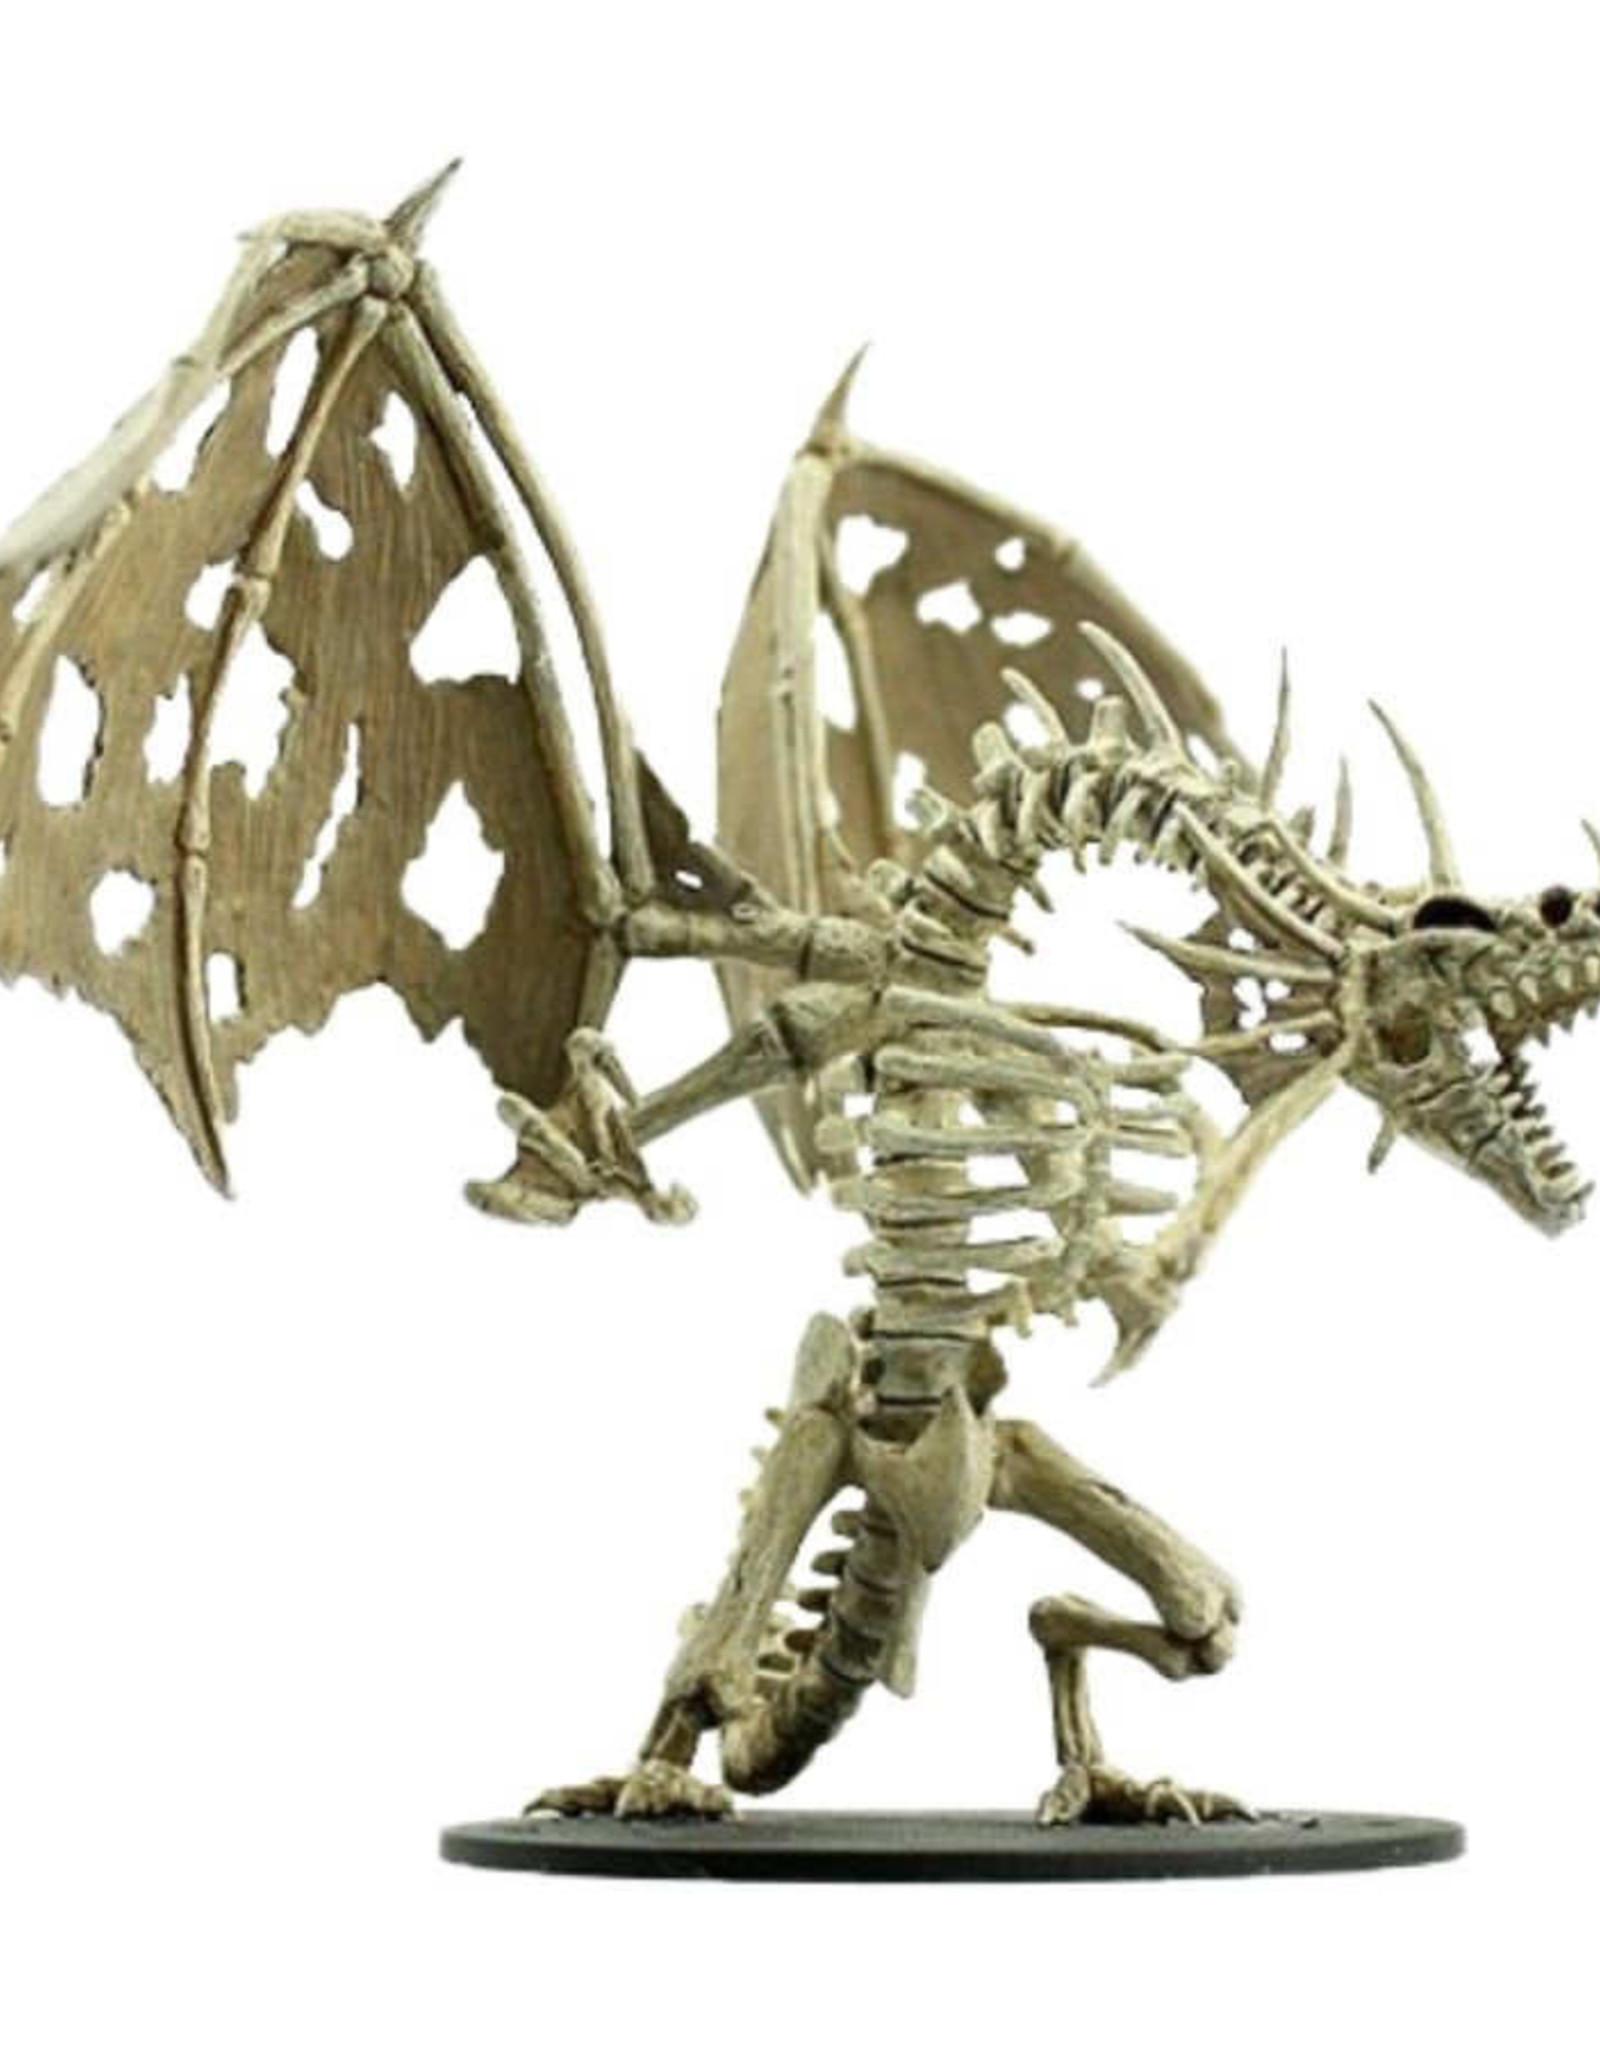 Wizkids Pathfinder Deep Cuts Unpainted Miniatures: Gargantuan Skeletal Dragon